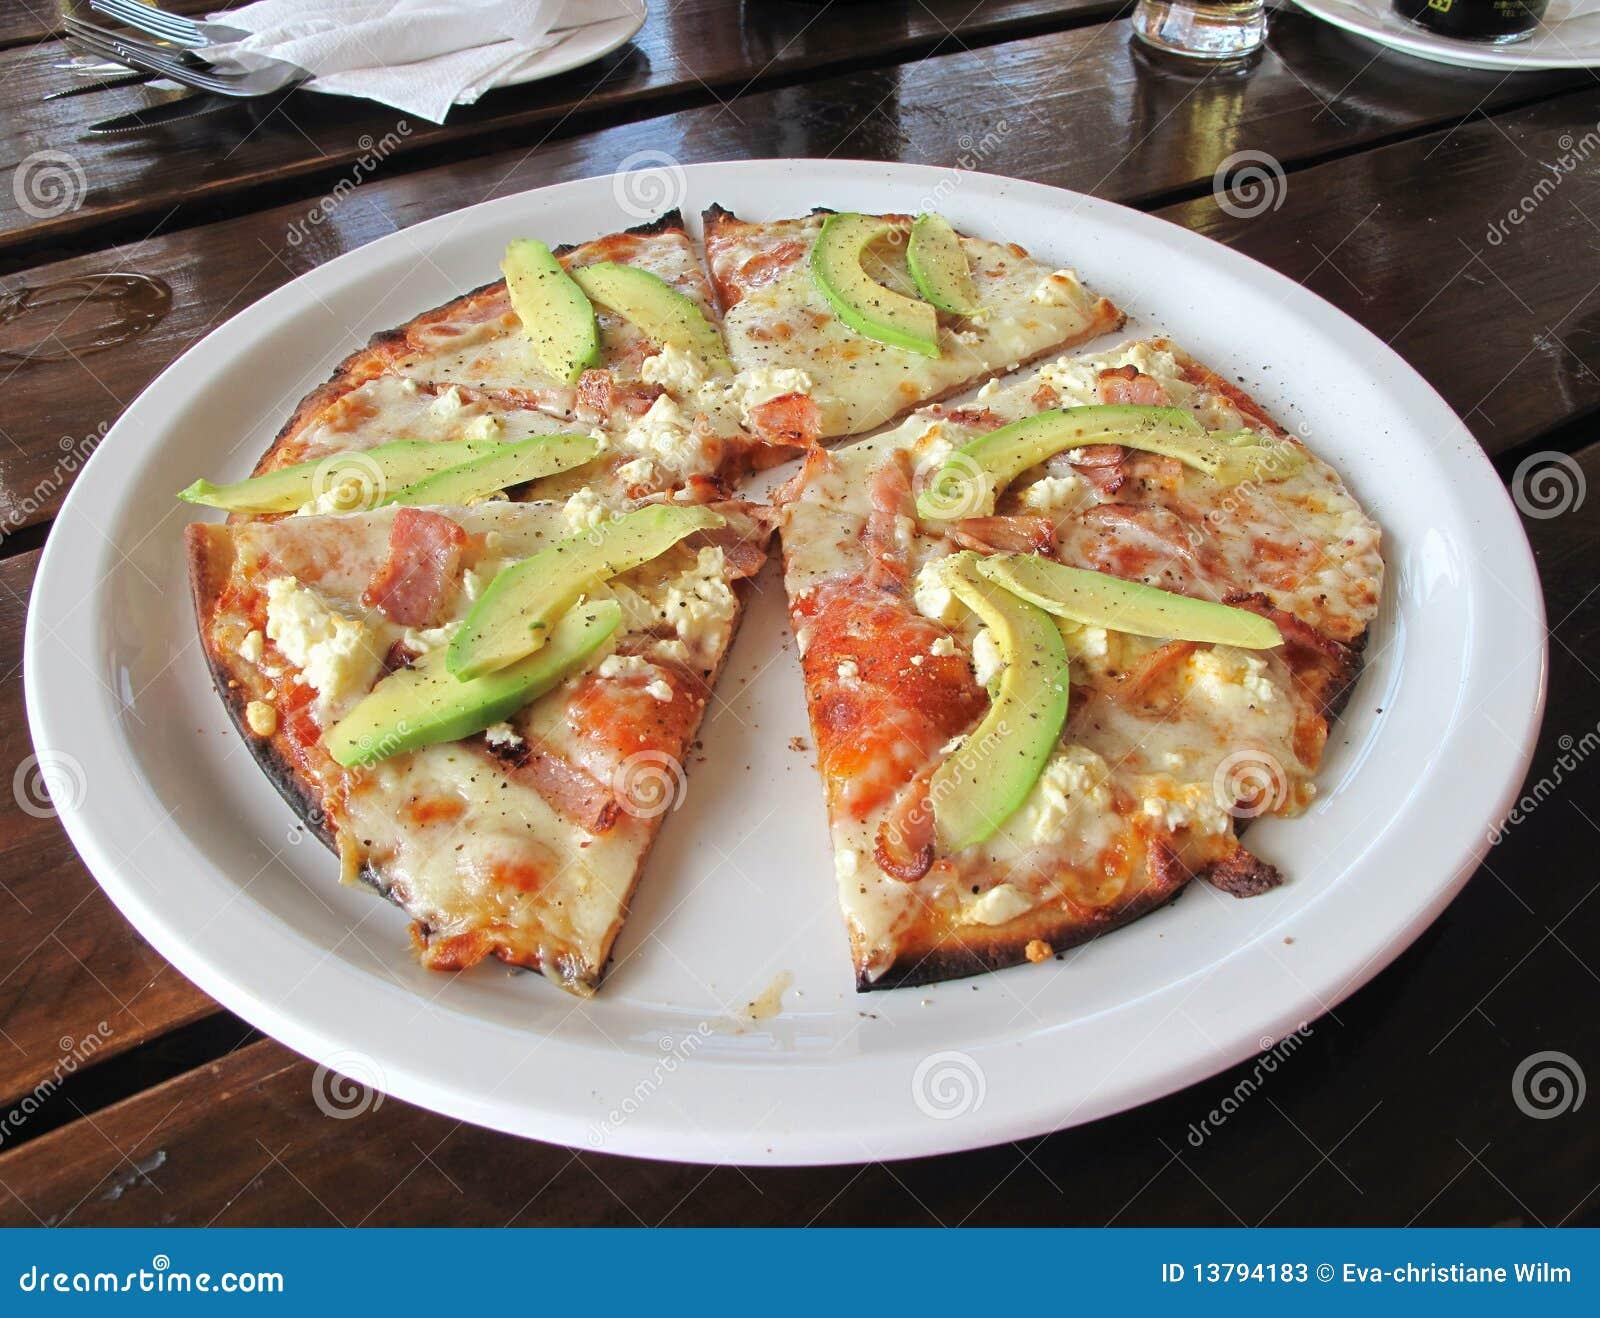 Avo, Bacon And Feta Pizza Stock Photos